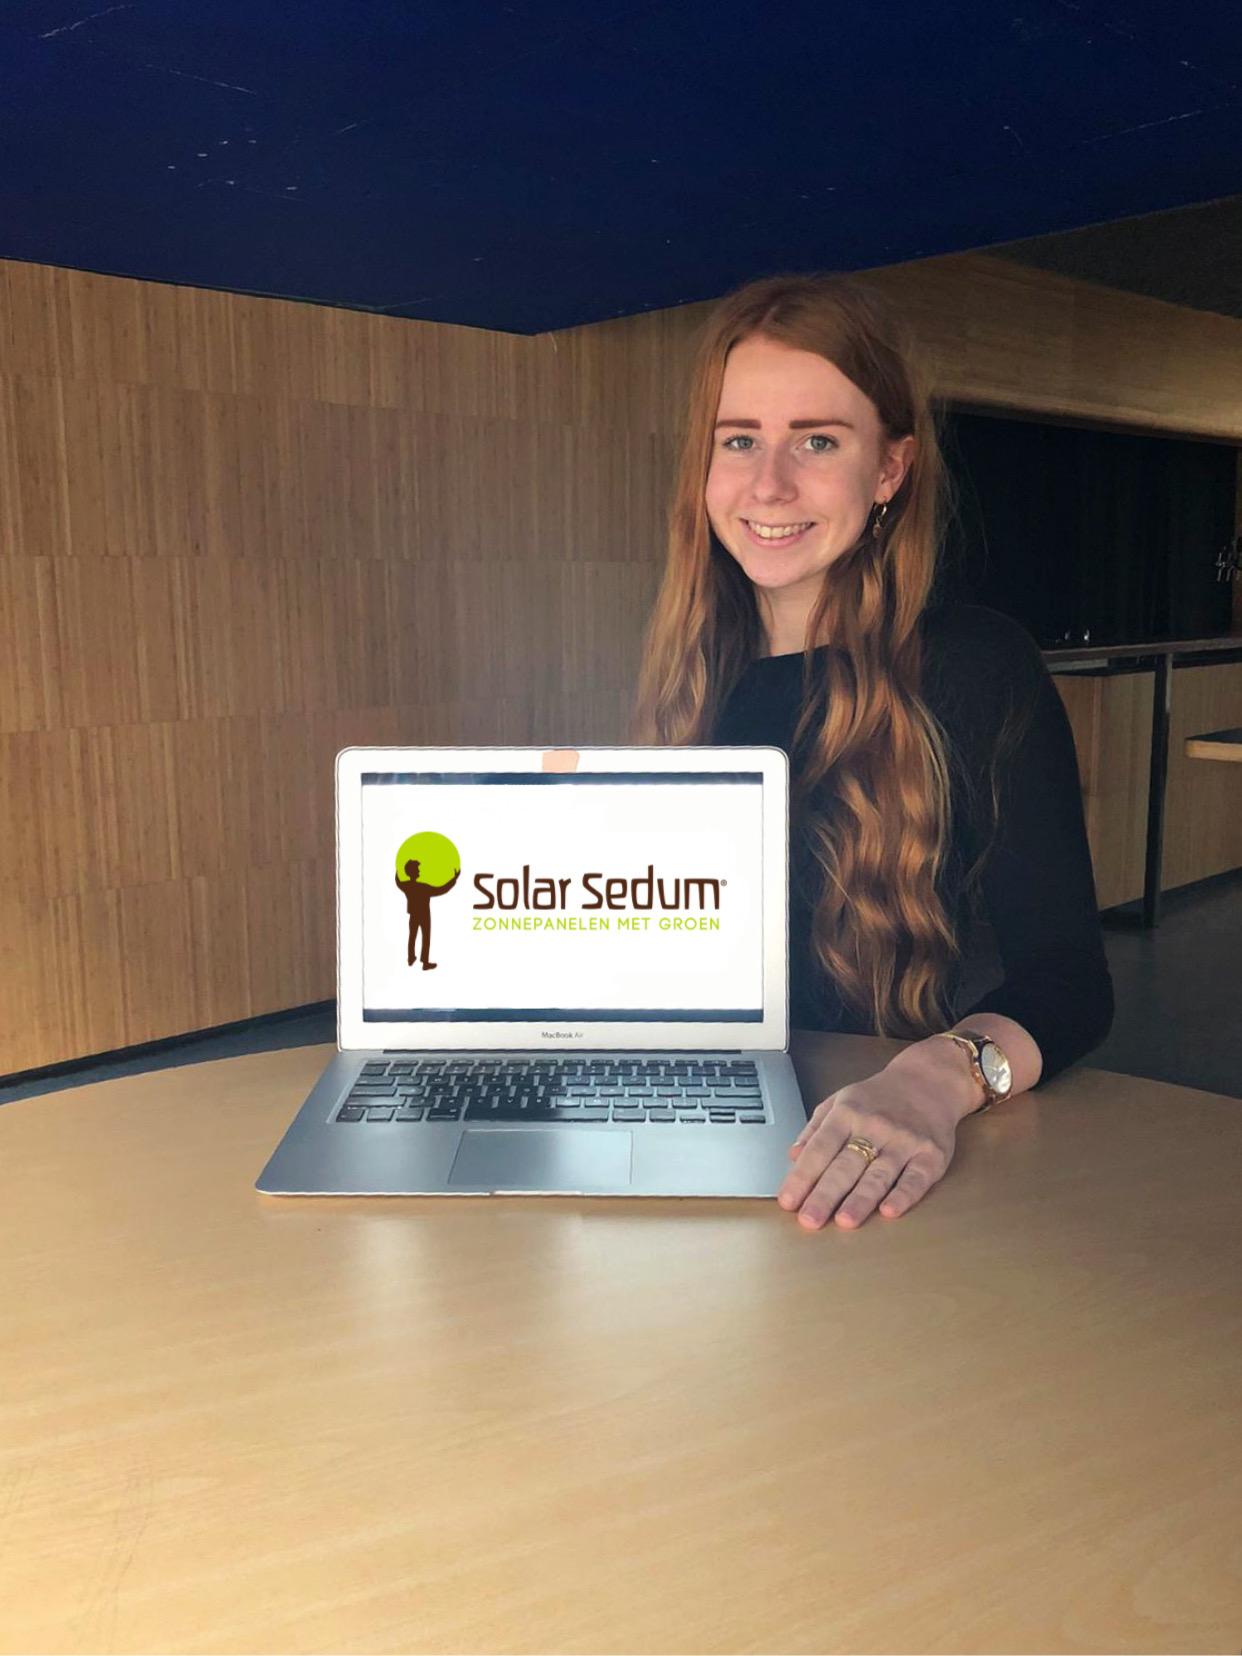 Een medewerker van Solar Sedum die advies op maat biedt